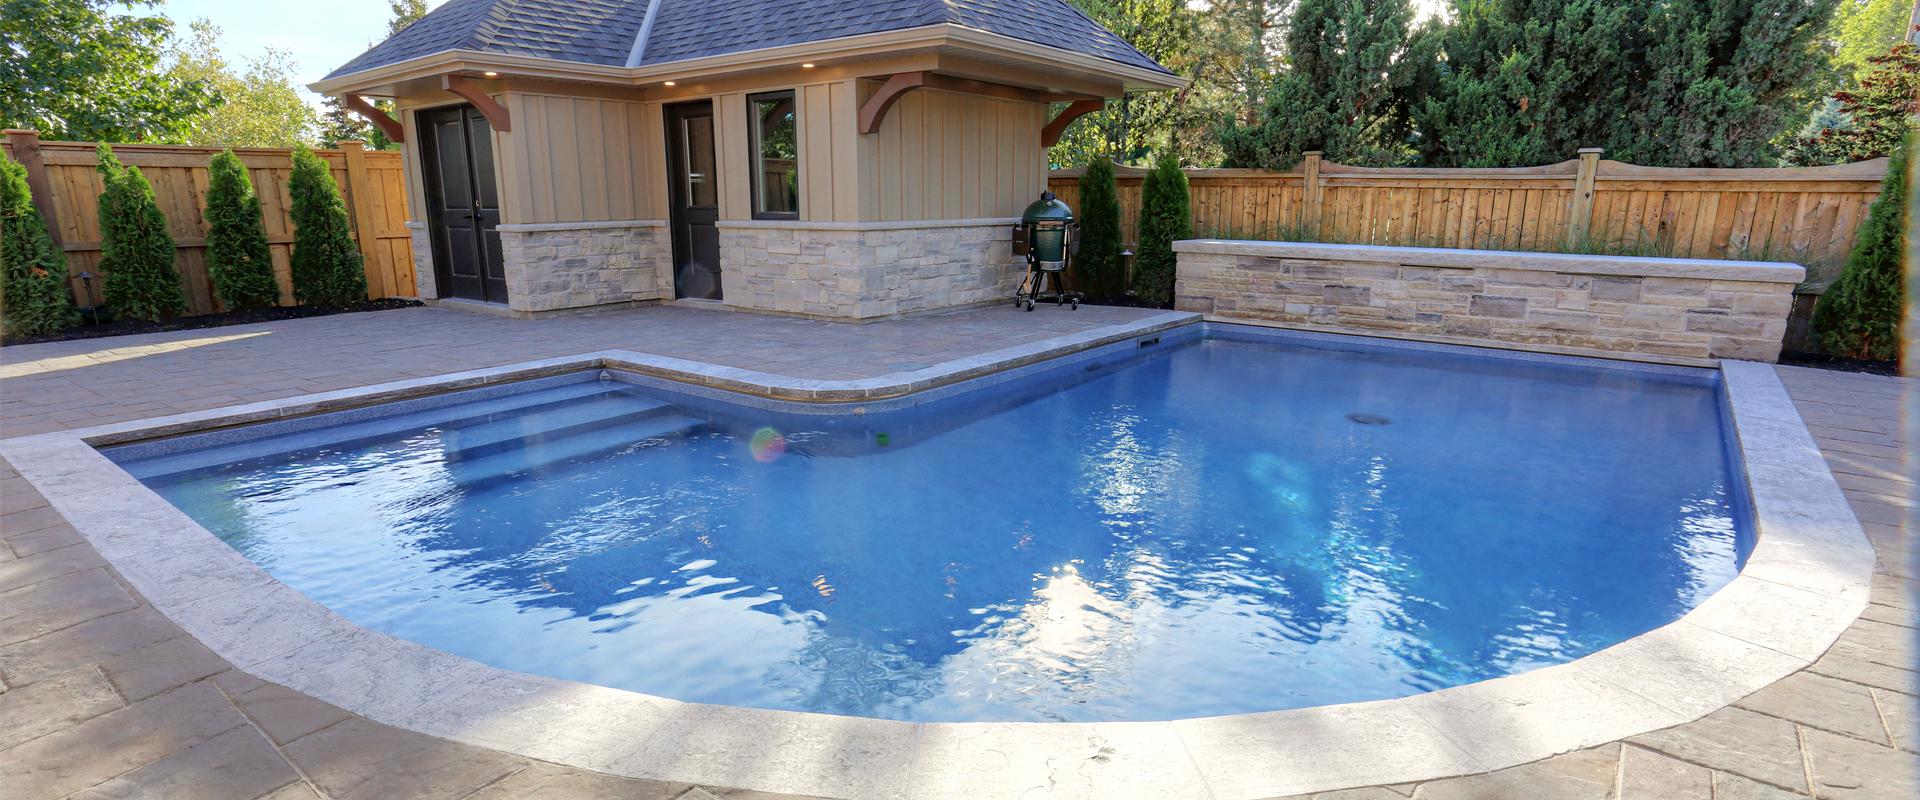 Pelham Lazy L Inground Pool Boldt Pools & Spas